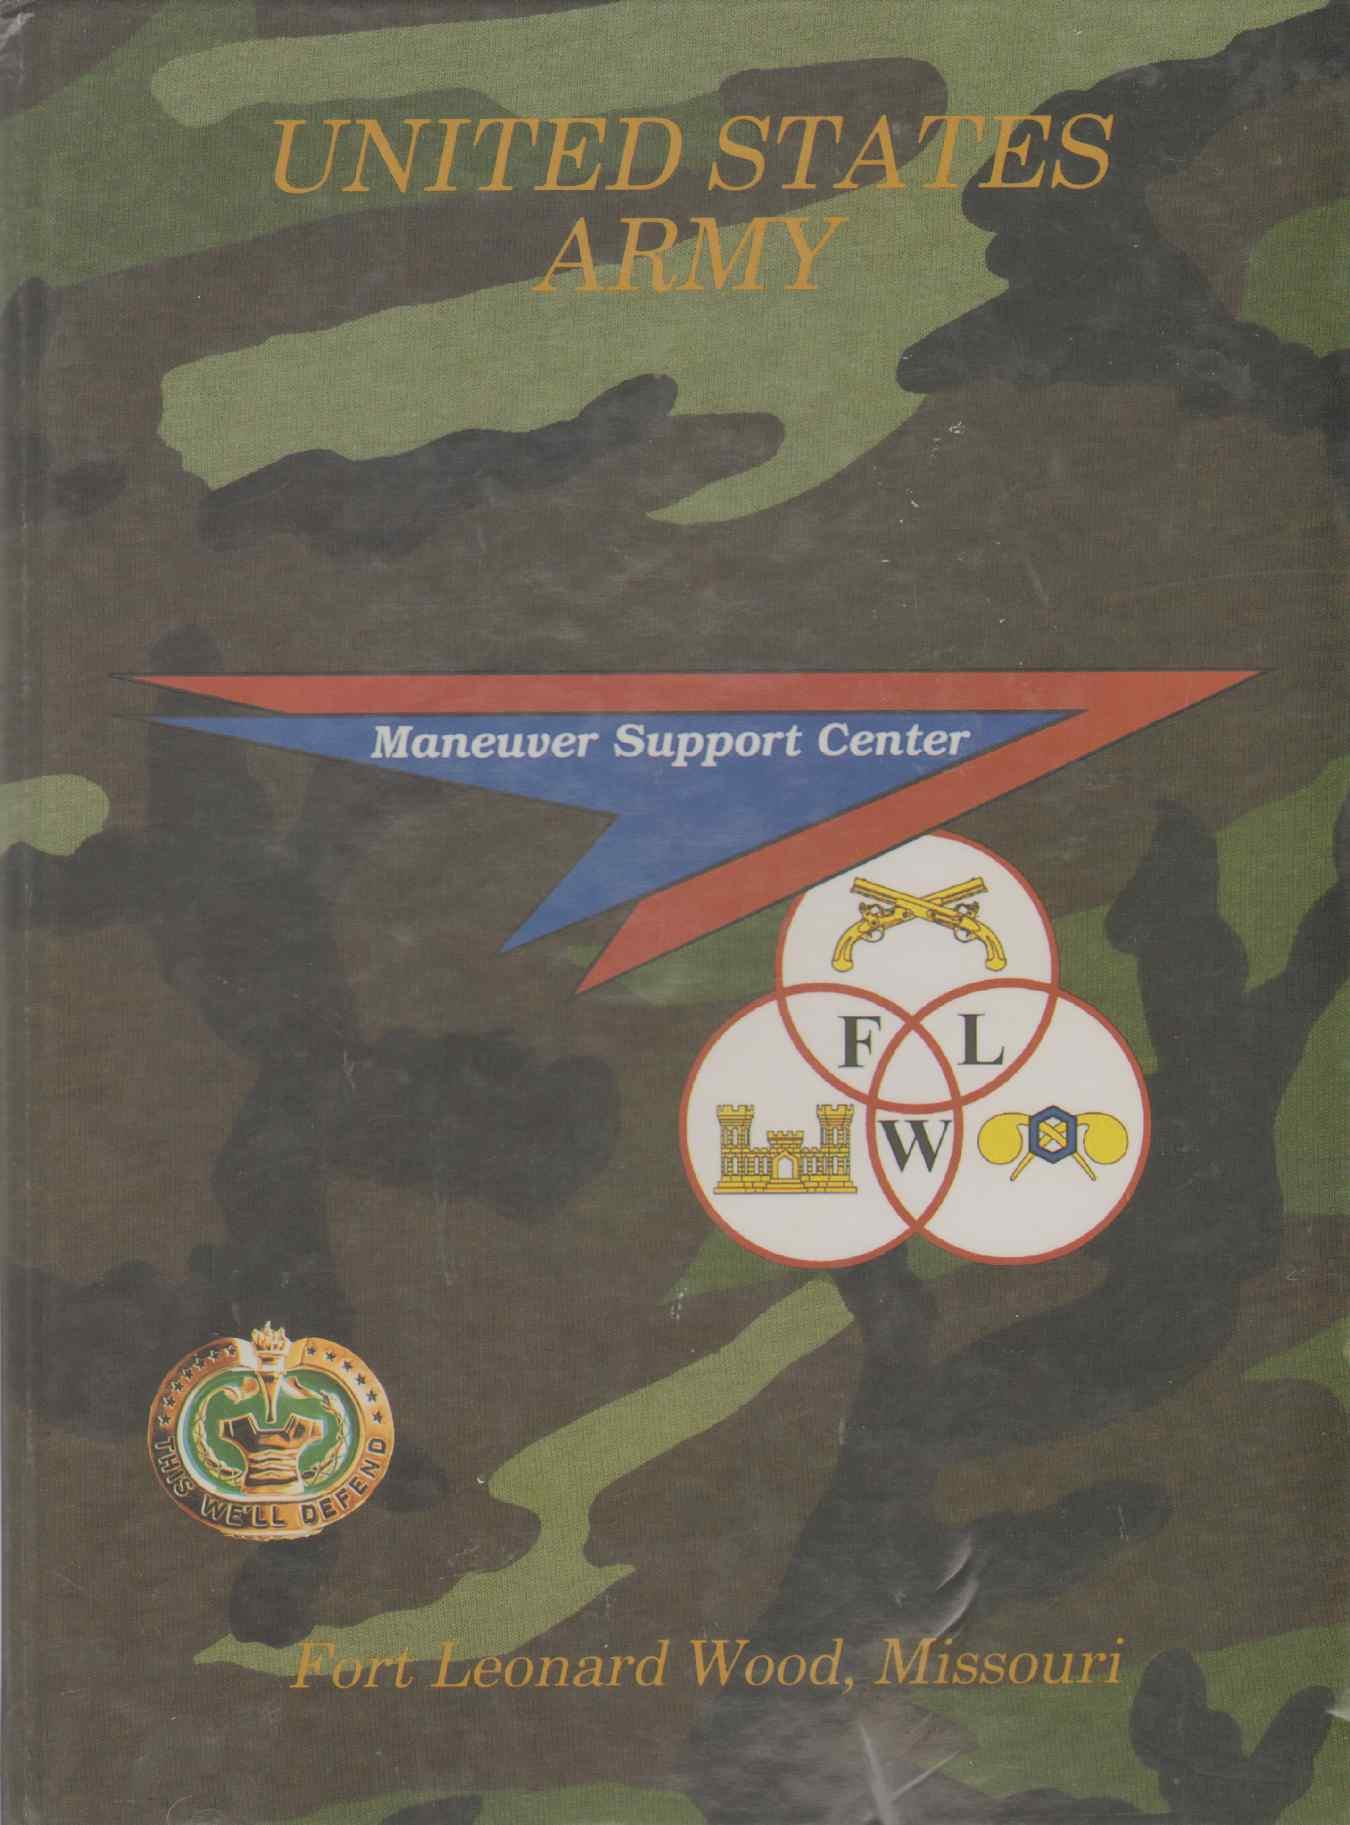 MANEUVER SUPPORT CENTER Fort Leonard Wood, Missouri, United States Army